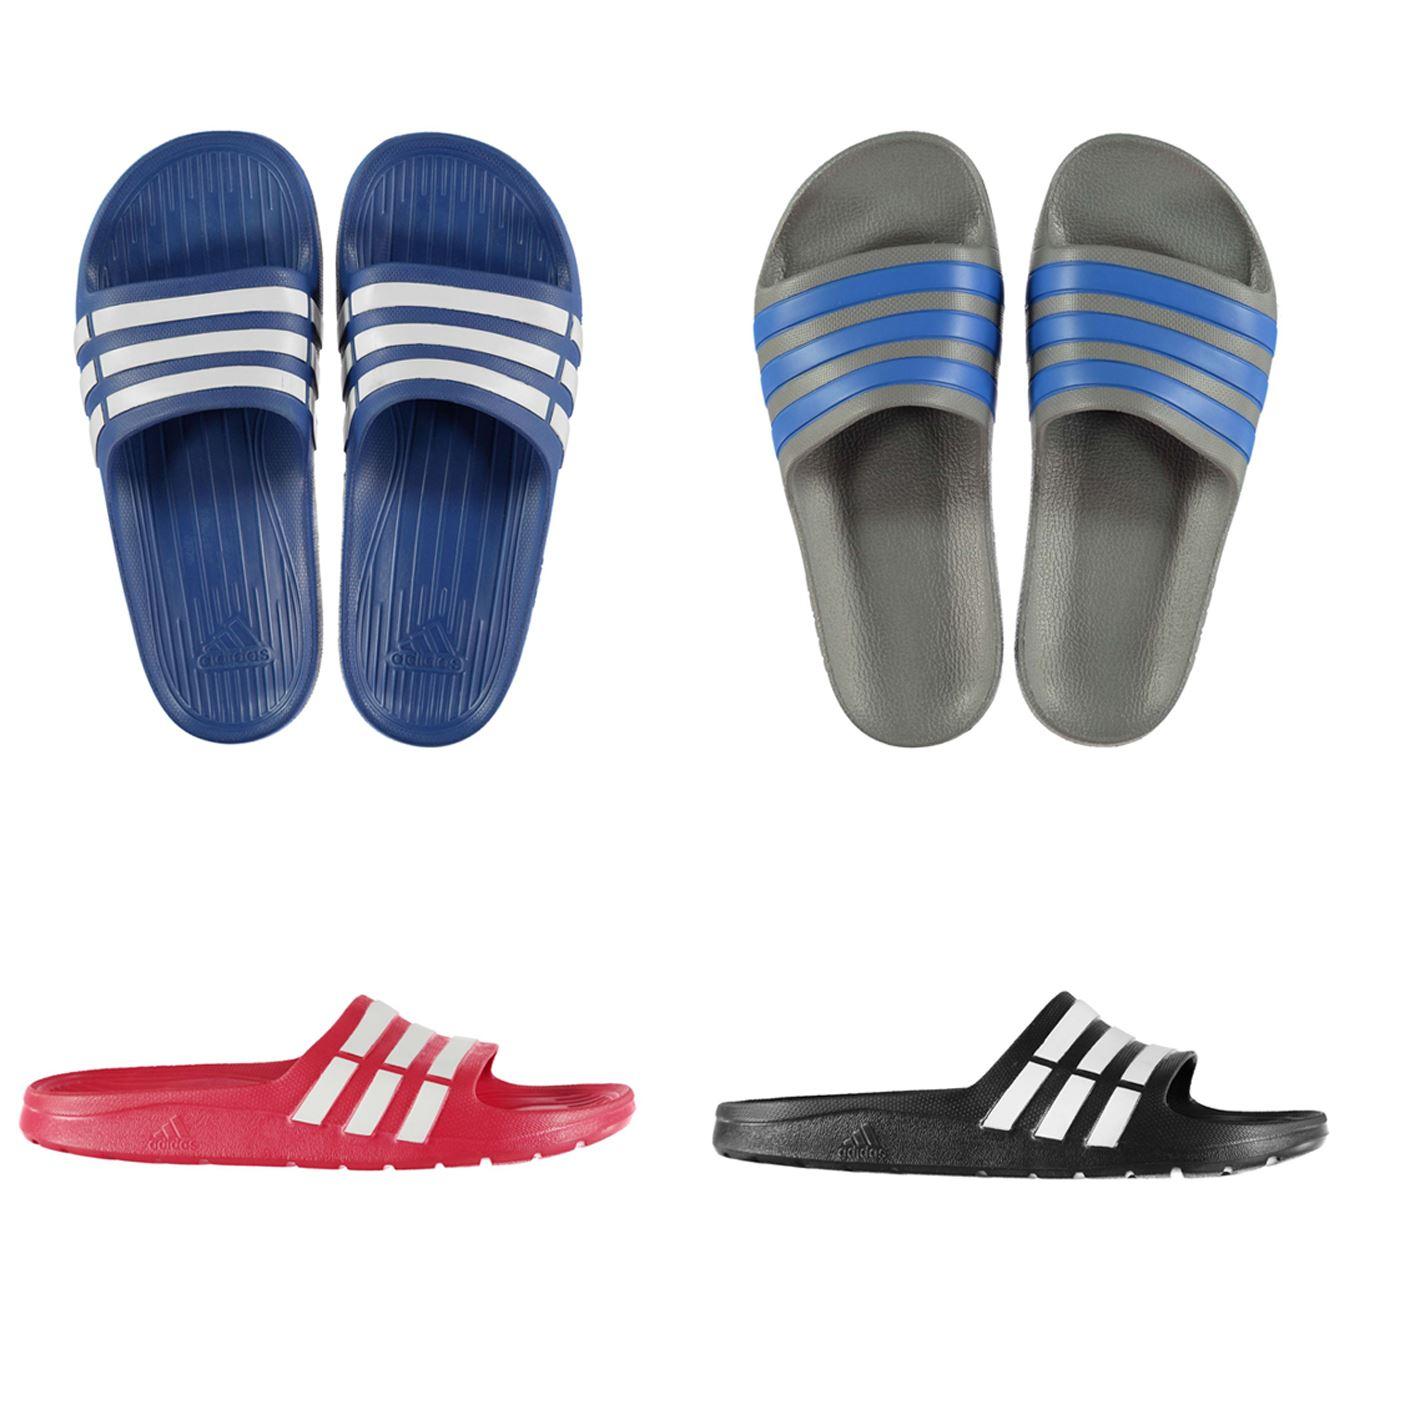 Adidas Duramo Tongs Piscine Chaussures Juniors Garçons